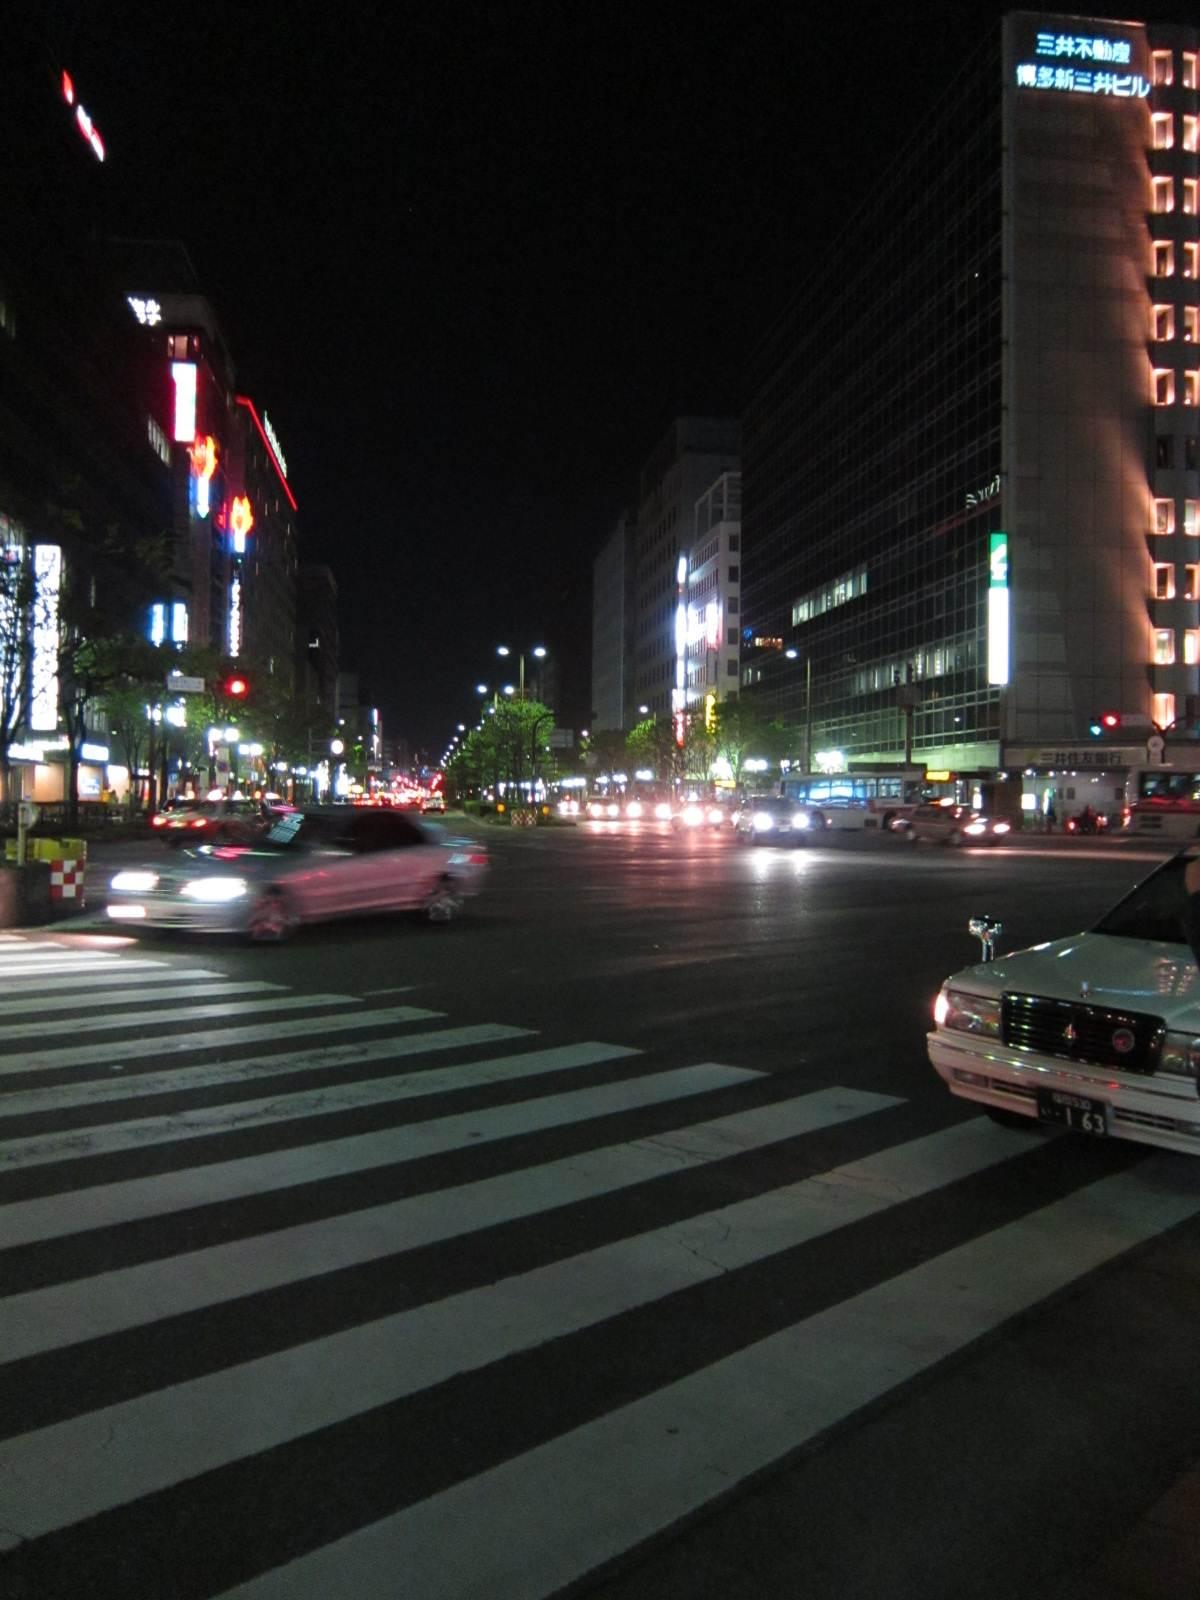 03_img_0419